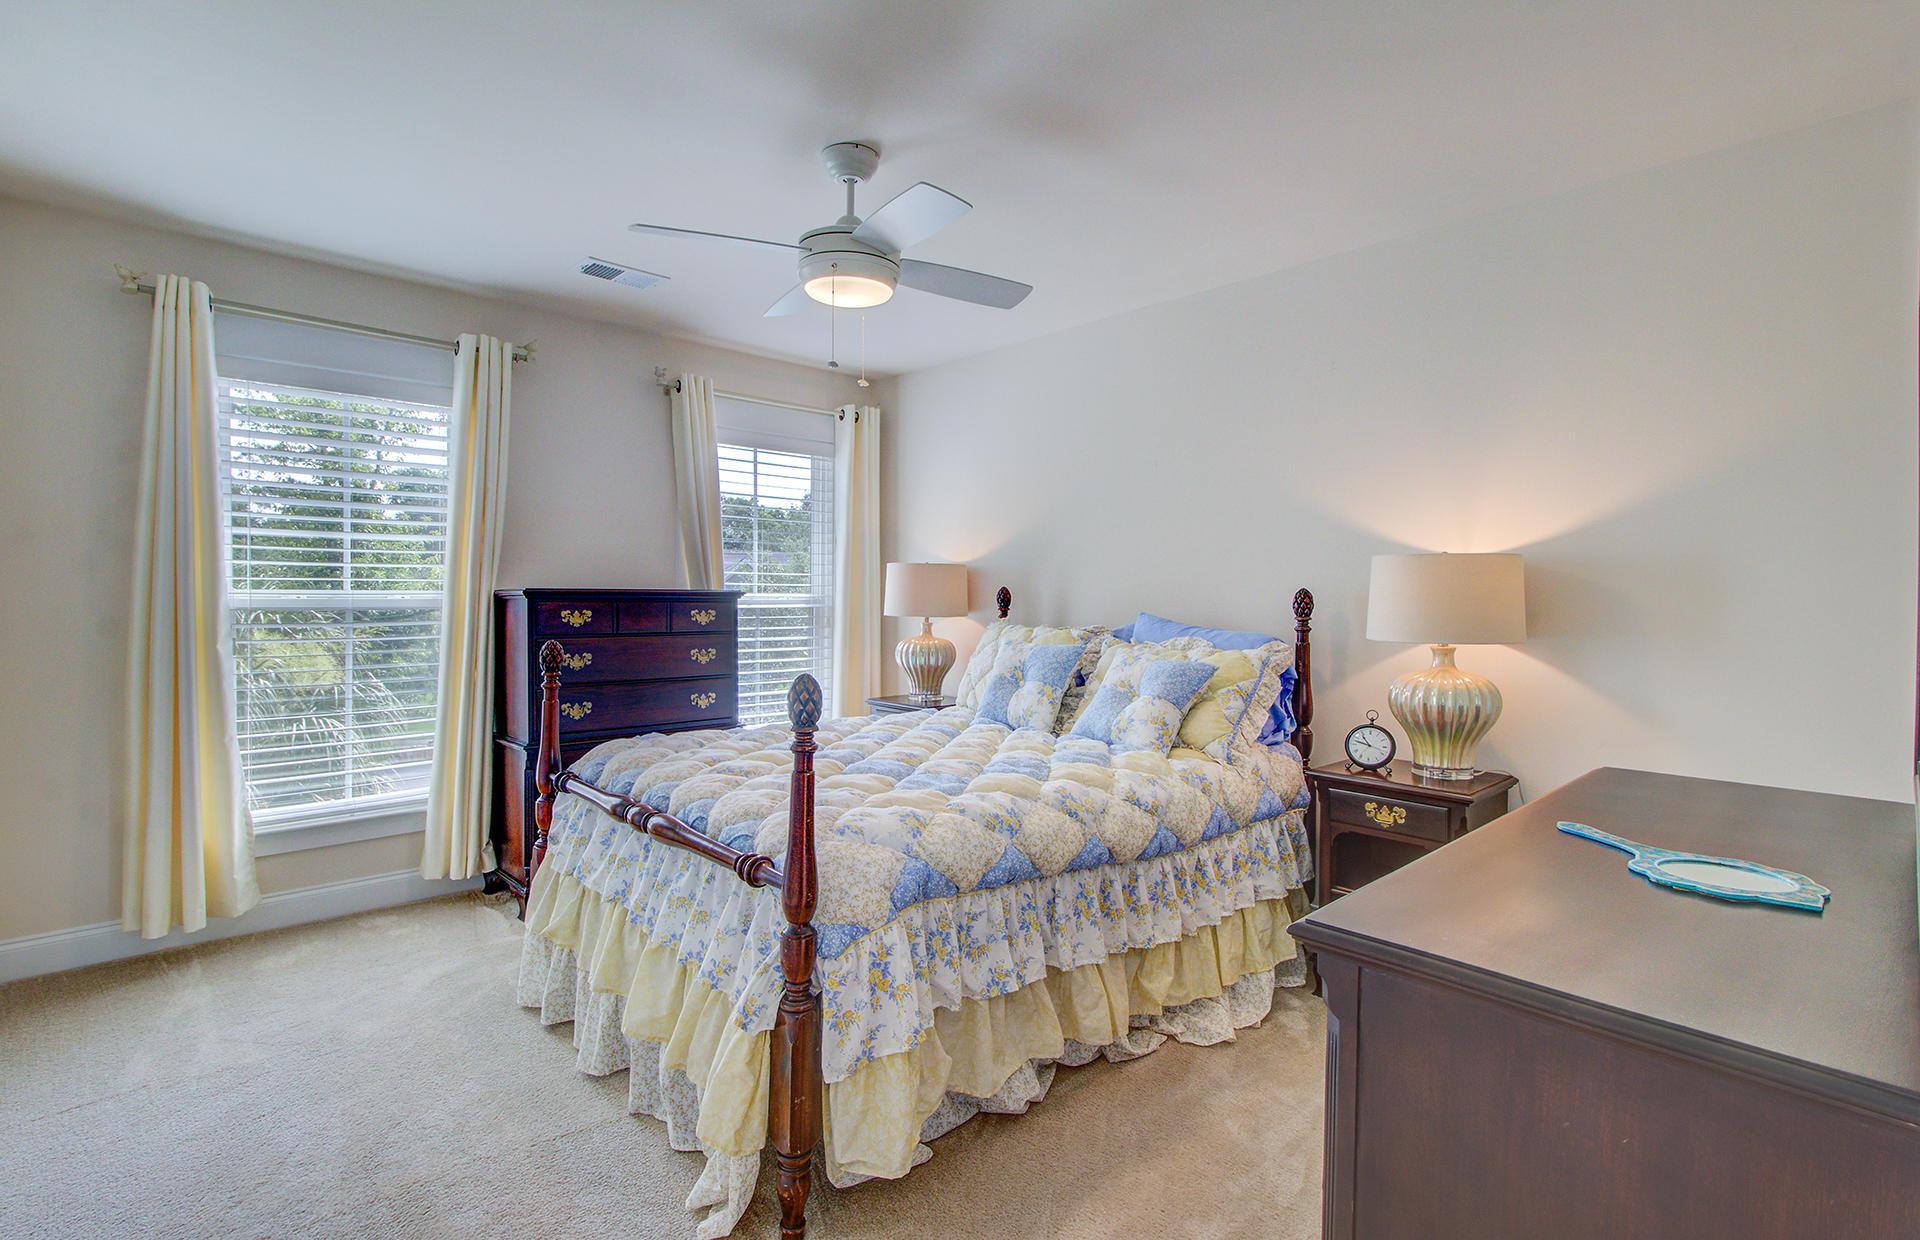 Scotts Creek Homes For Sale - 1404 Scotts Creek, Mount Pleasant, SC - 0